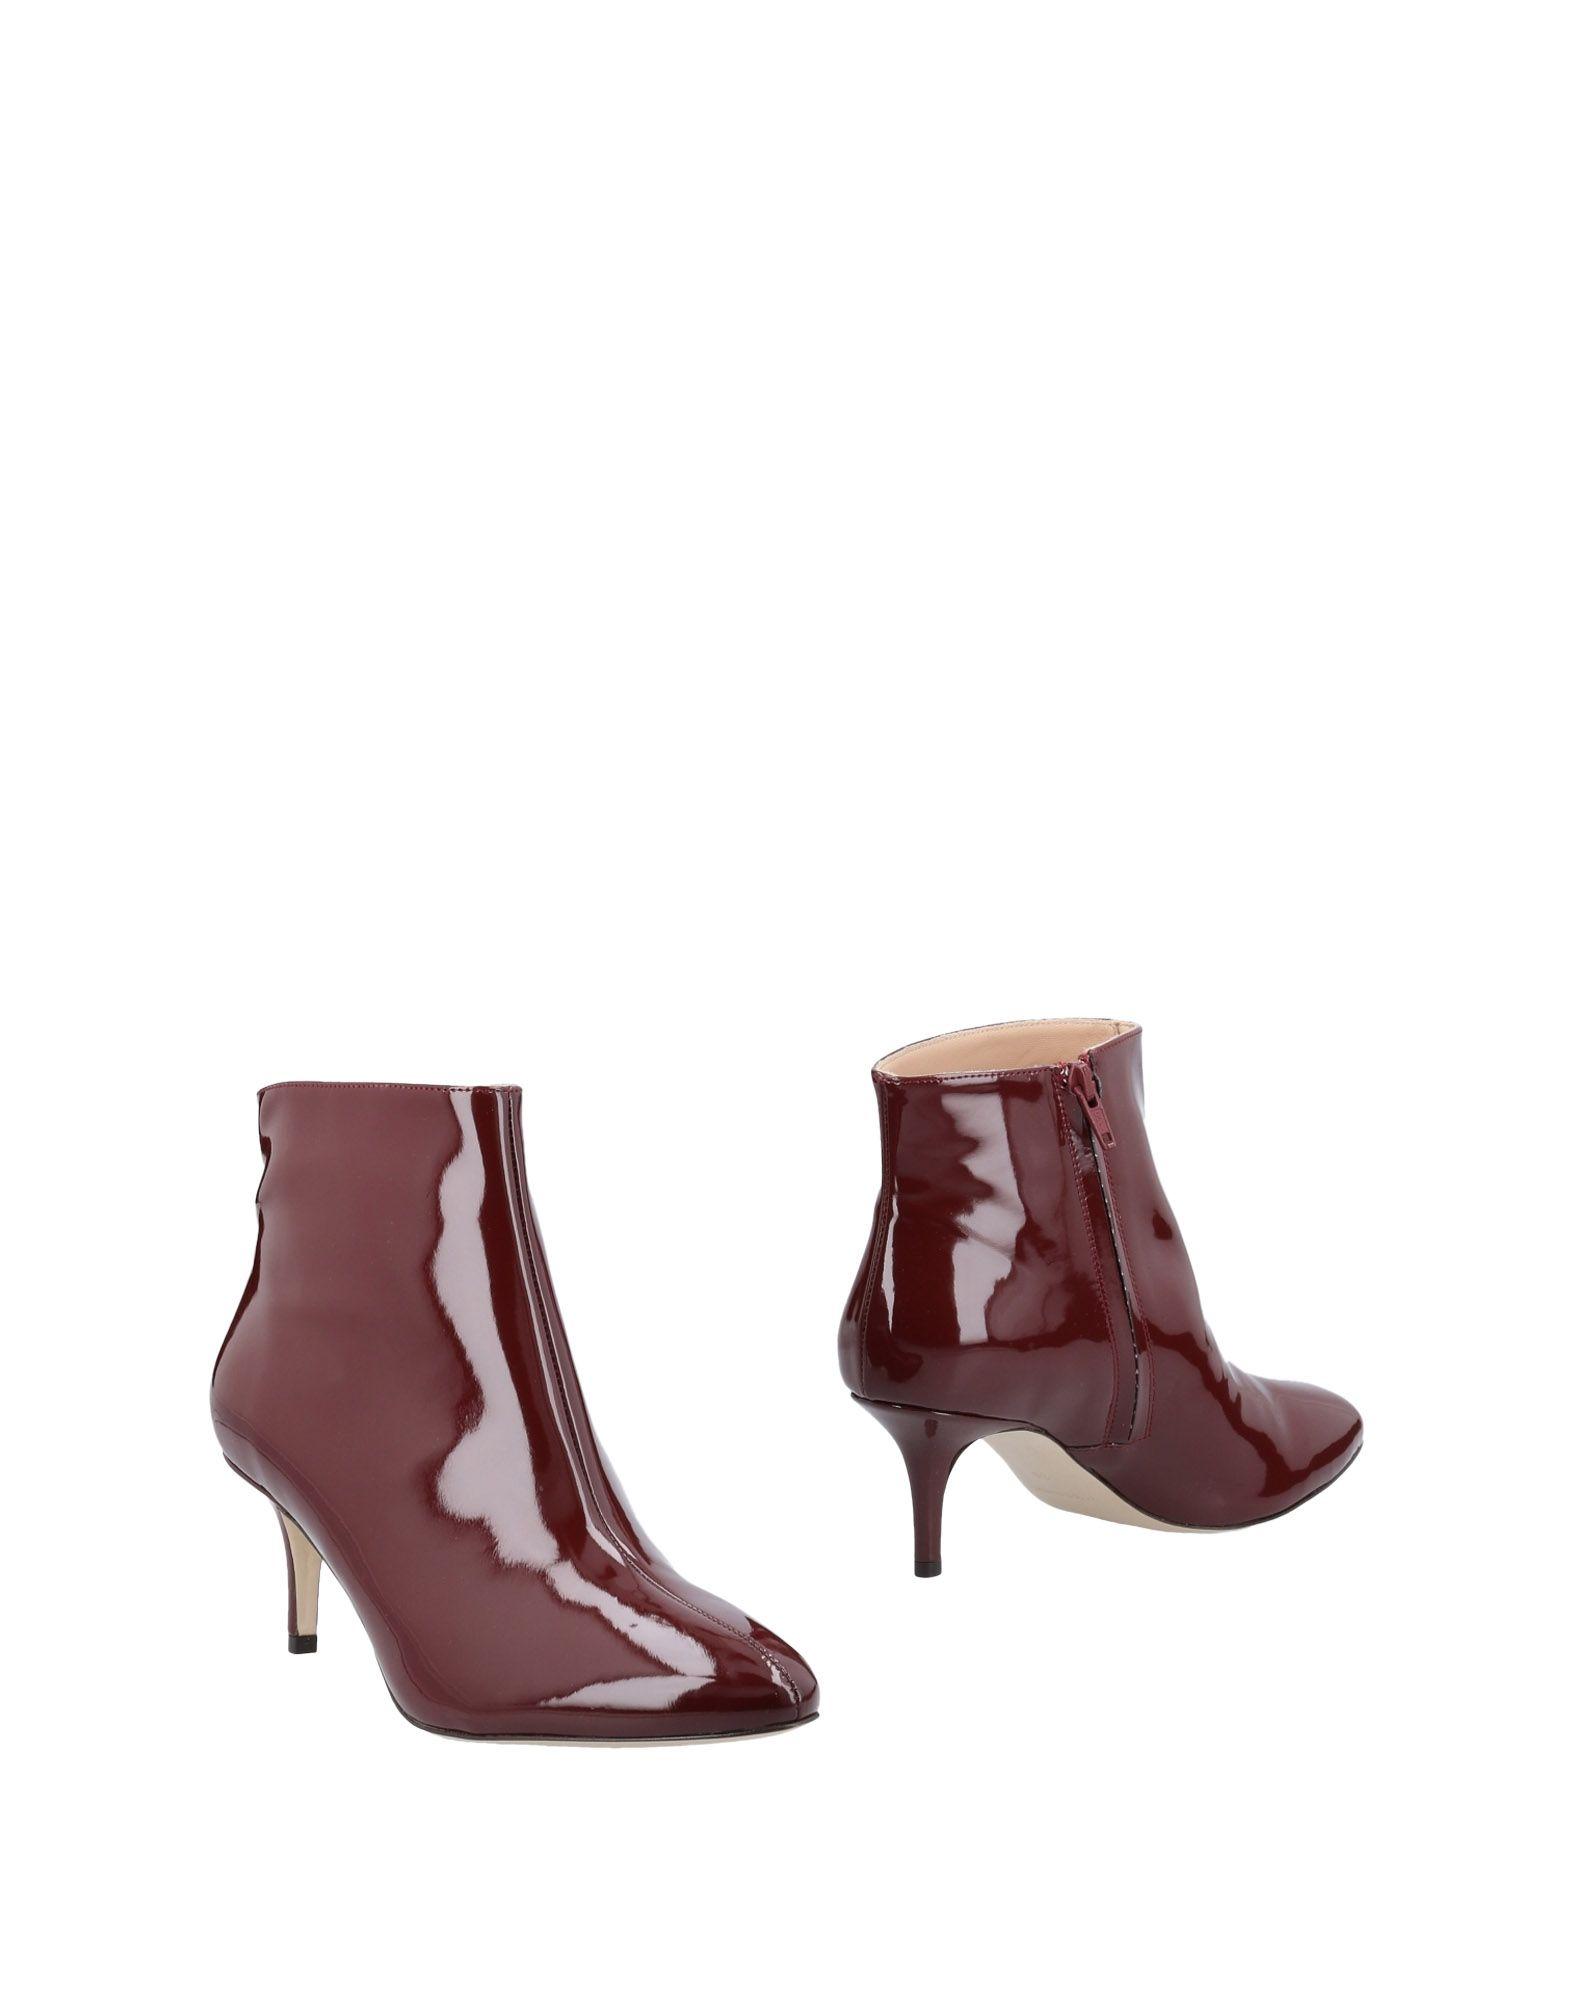 Marie Marí Stiefelette Damen  11484042AG Gute Qualität beliebte Schuhe